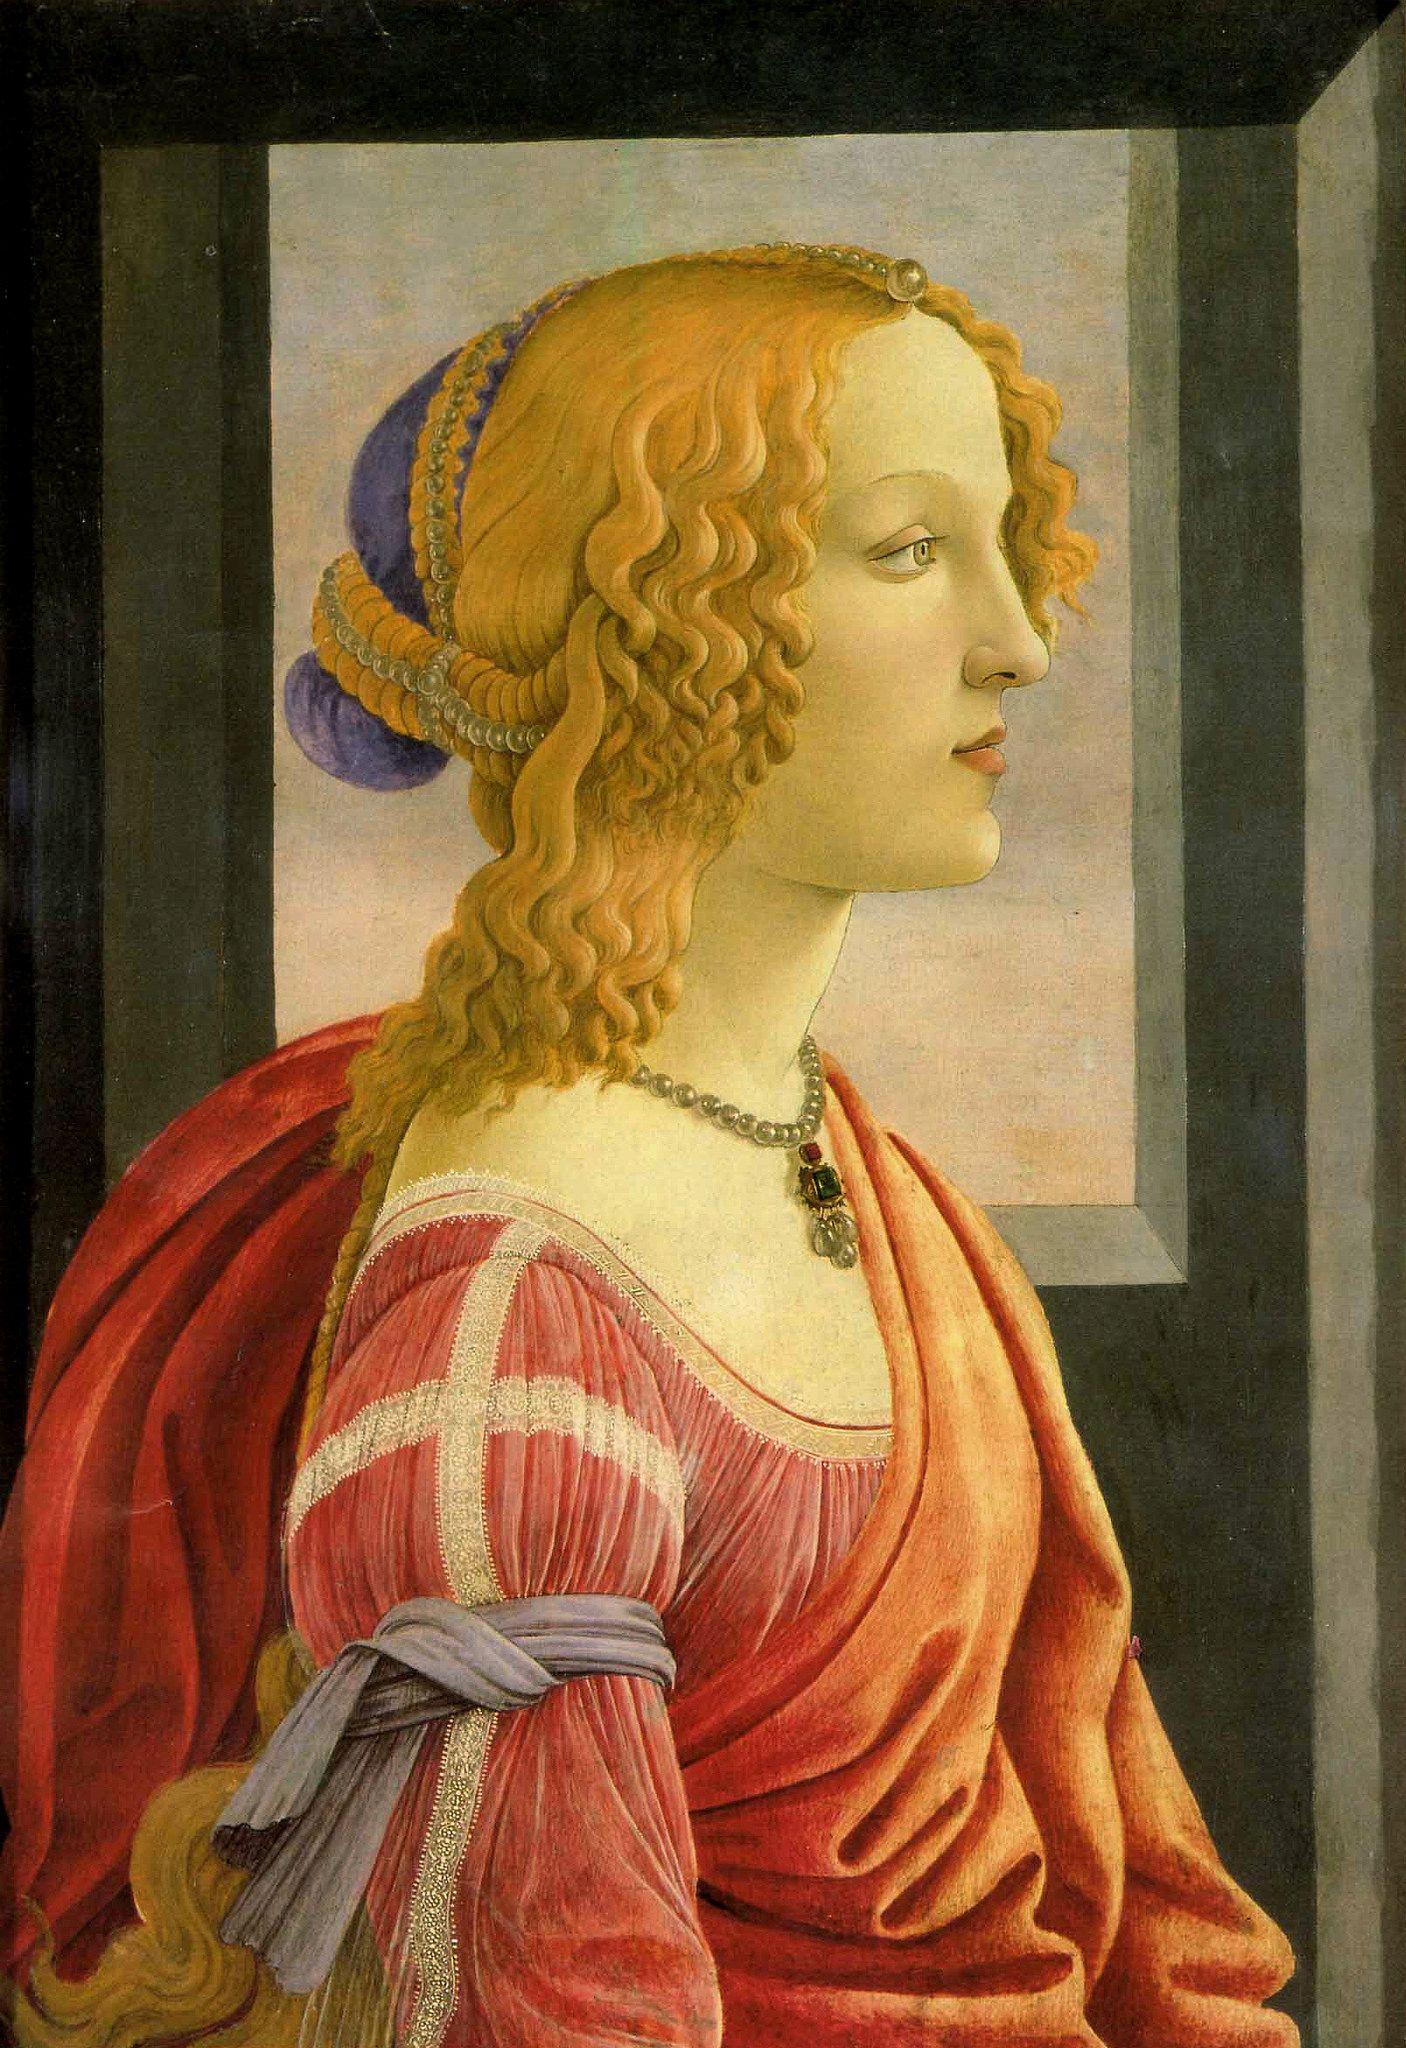 Caterina Sforza: biography 17